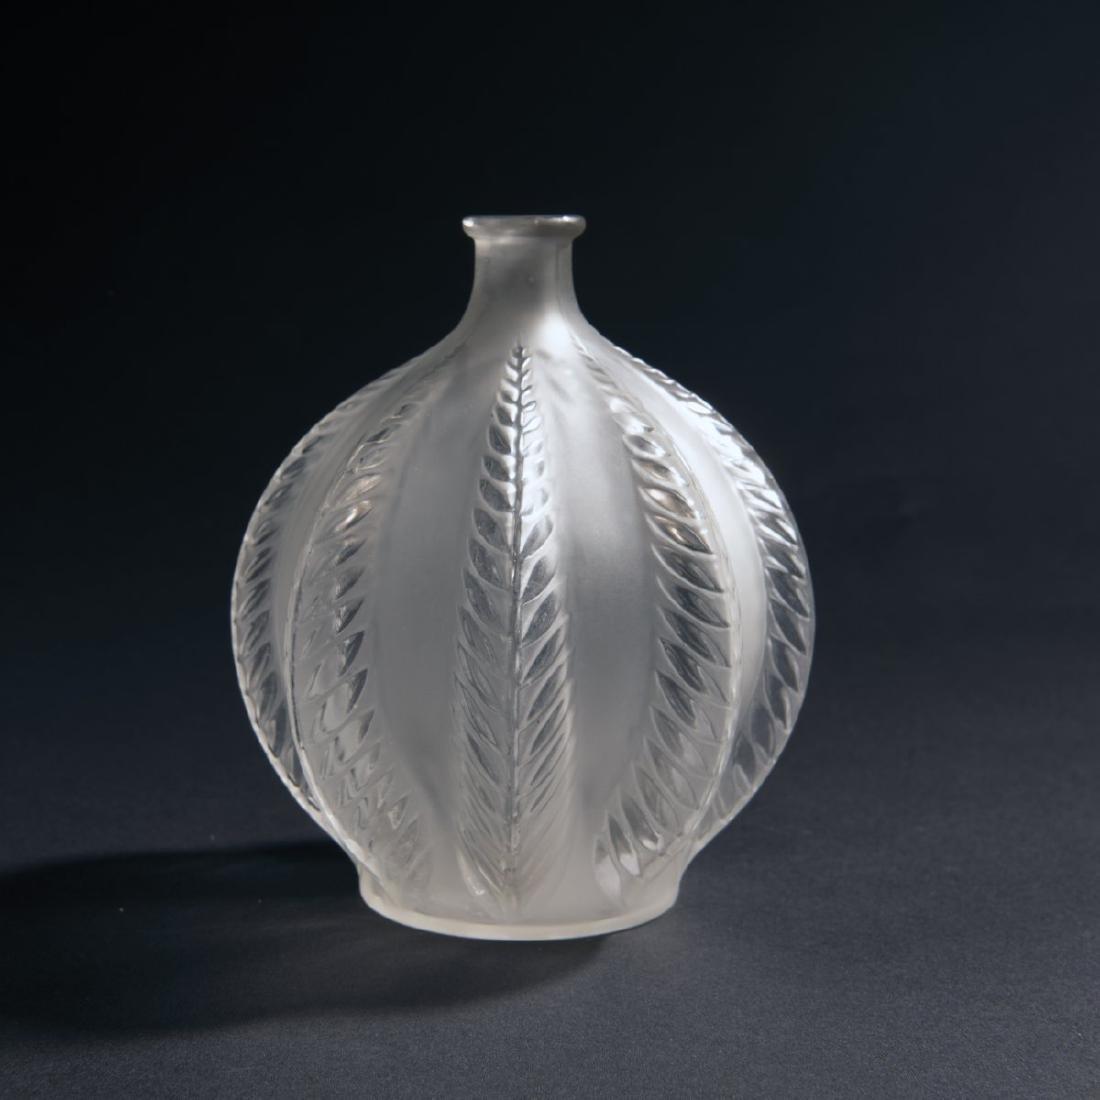 Rene Lalique, 'Malines' vase, 1924